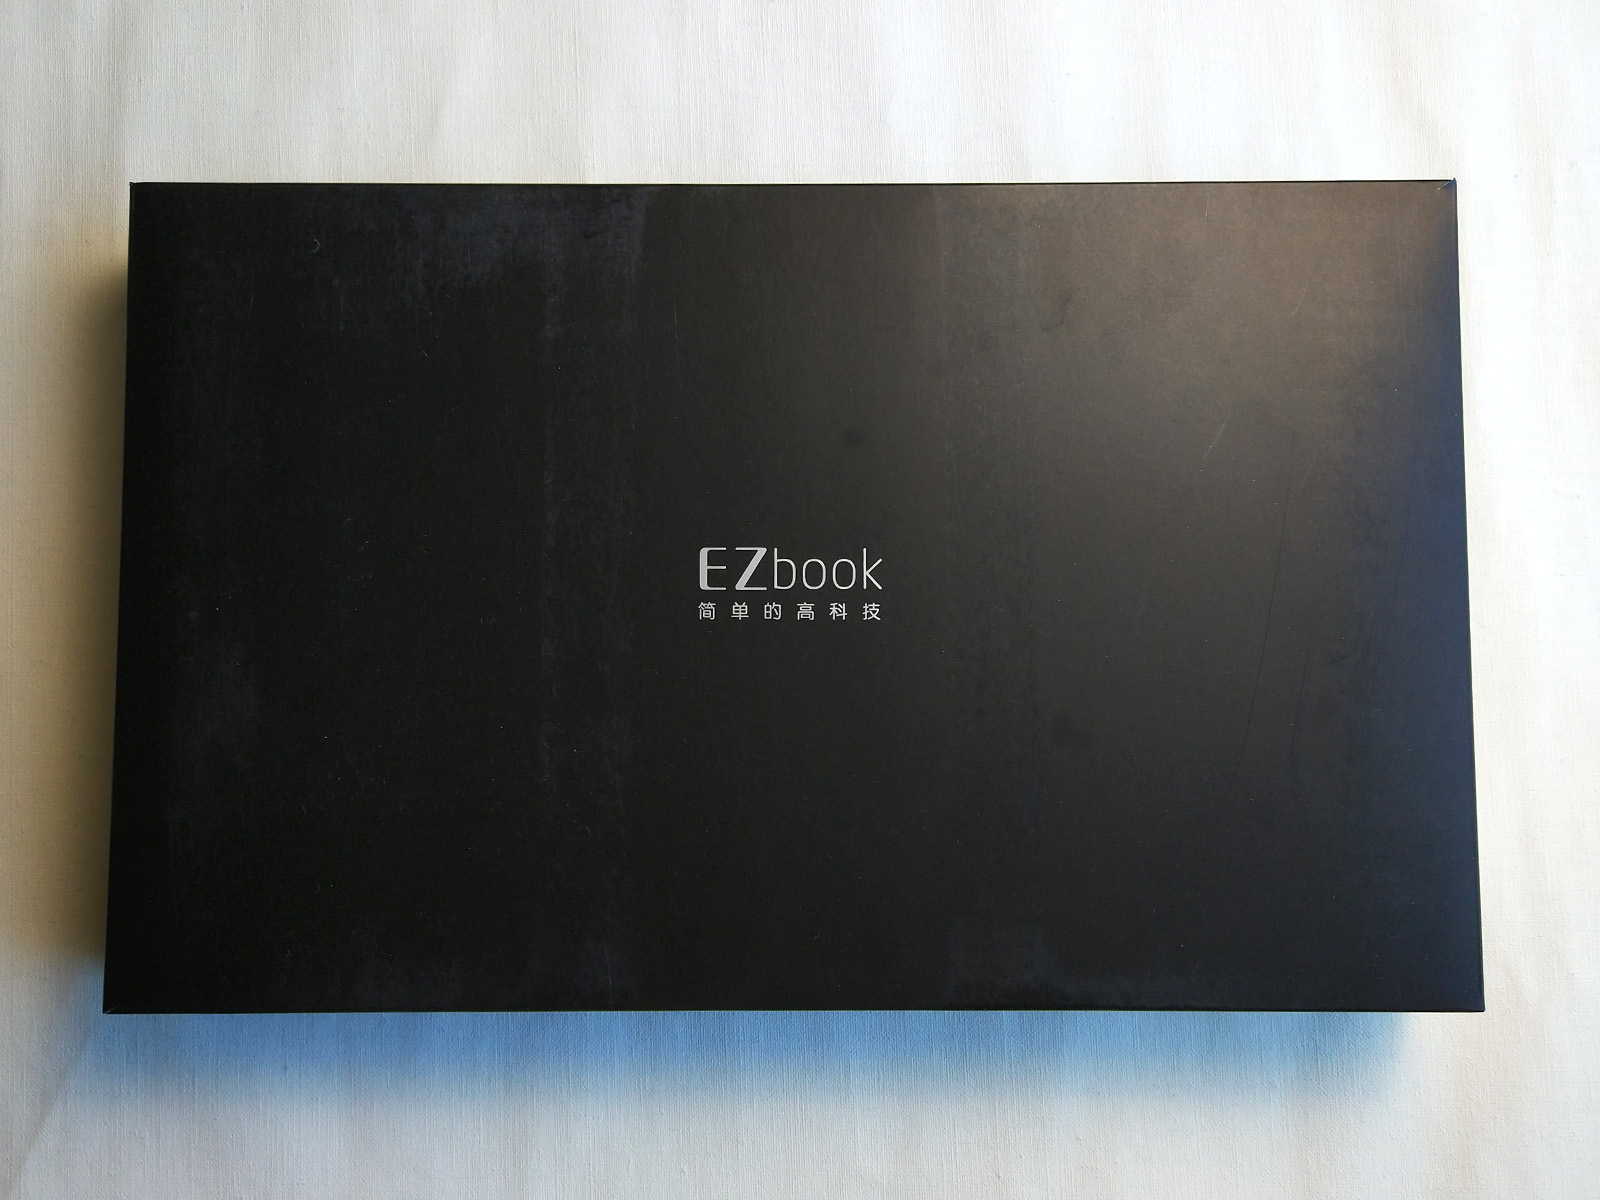 jumper-ezbook-air-first-look-unboxing-01